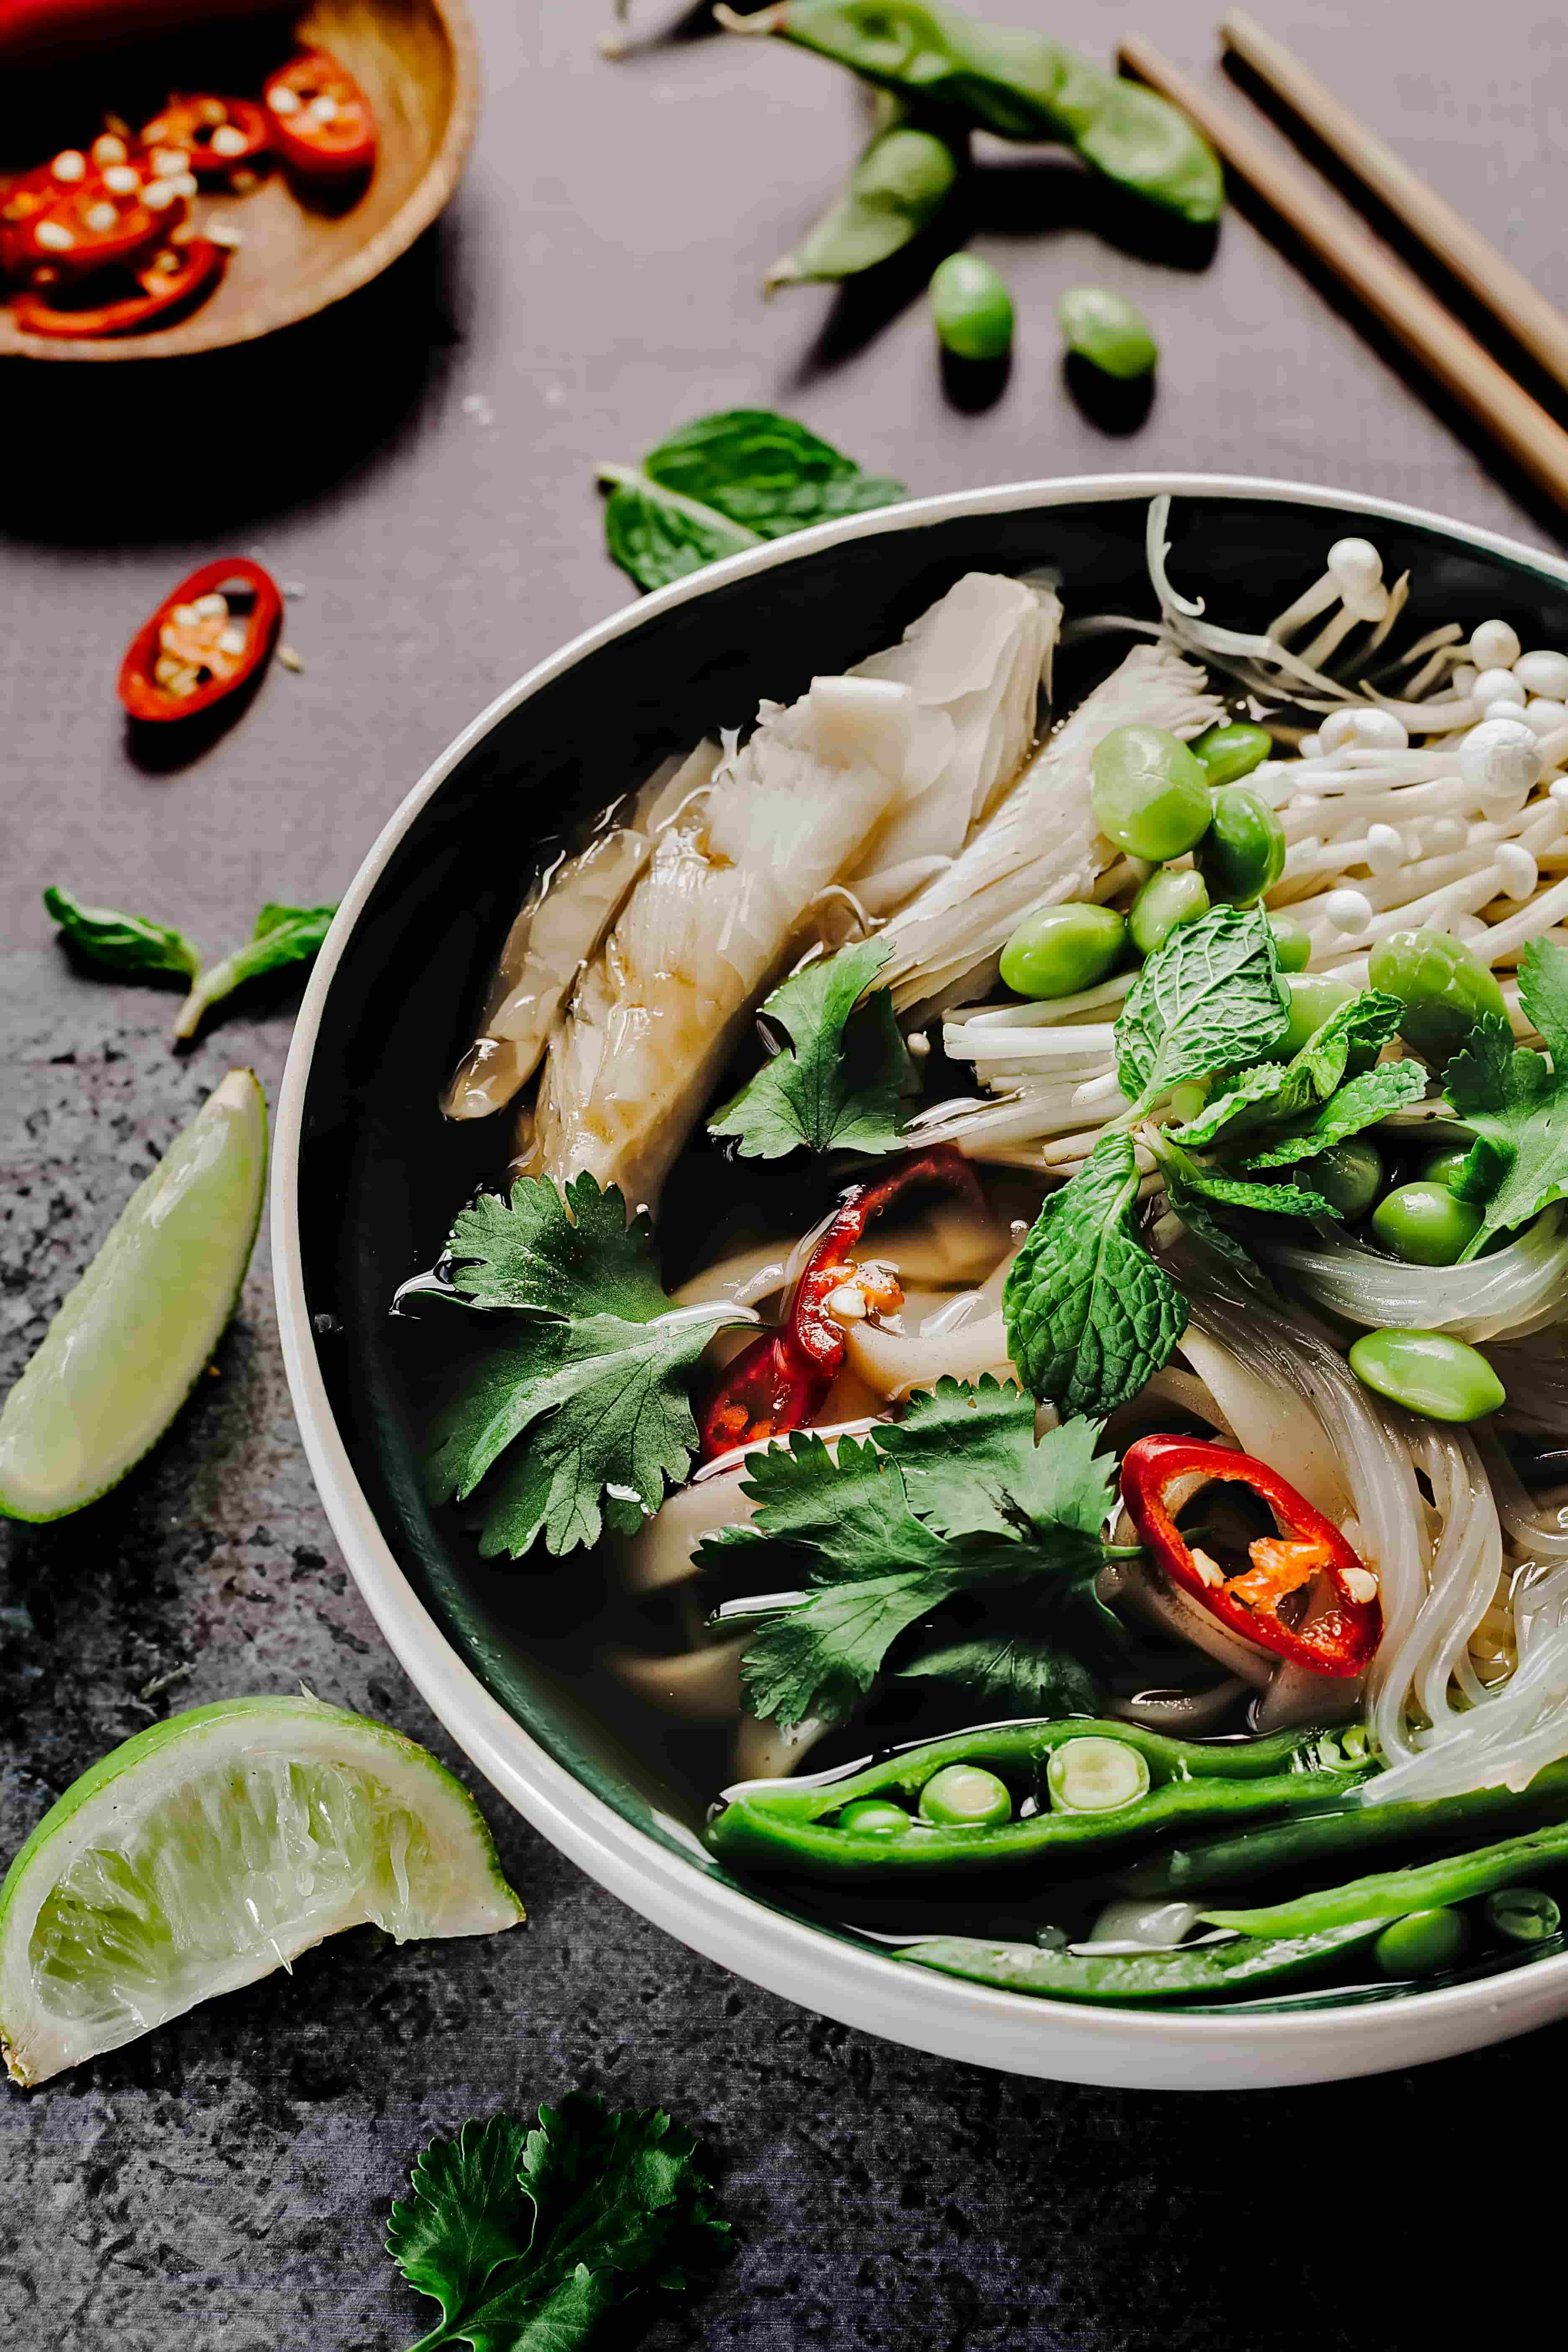 Vietnamese Menu: Spotlight on Pho